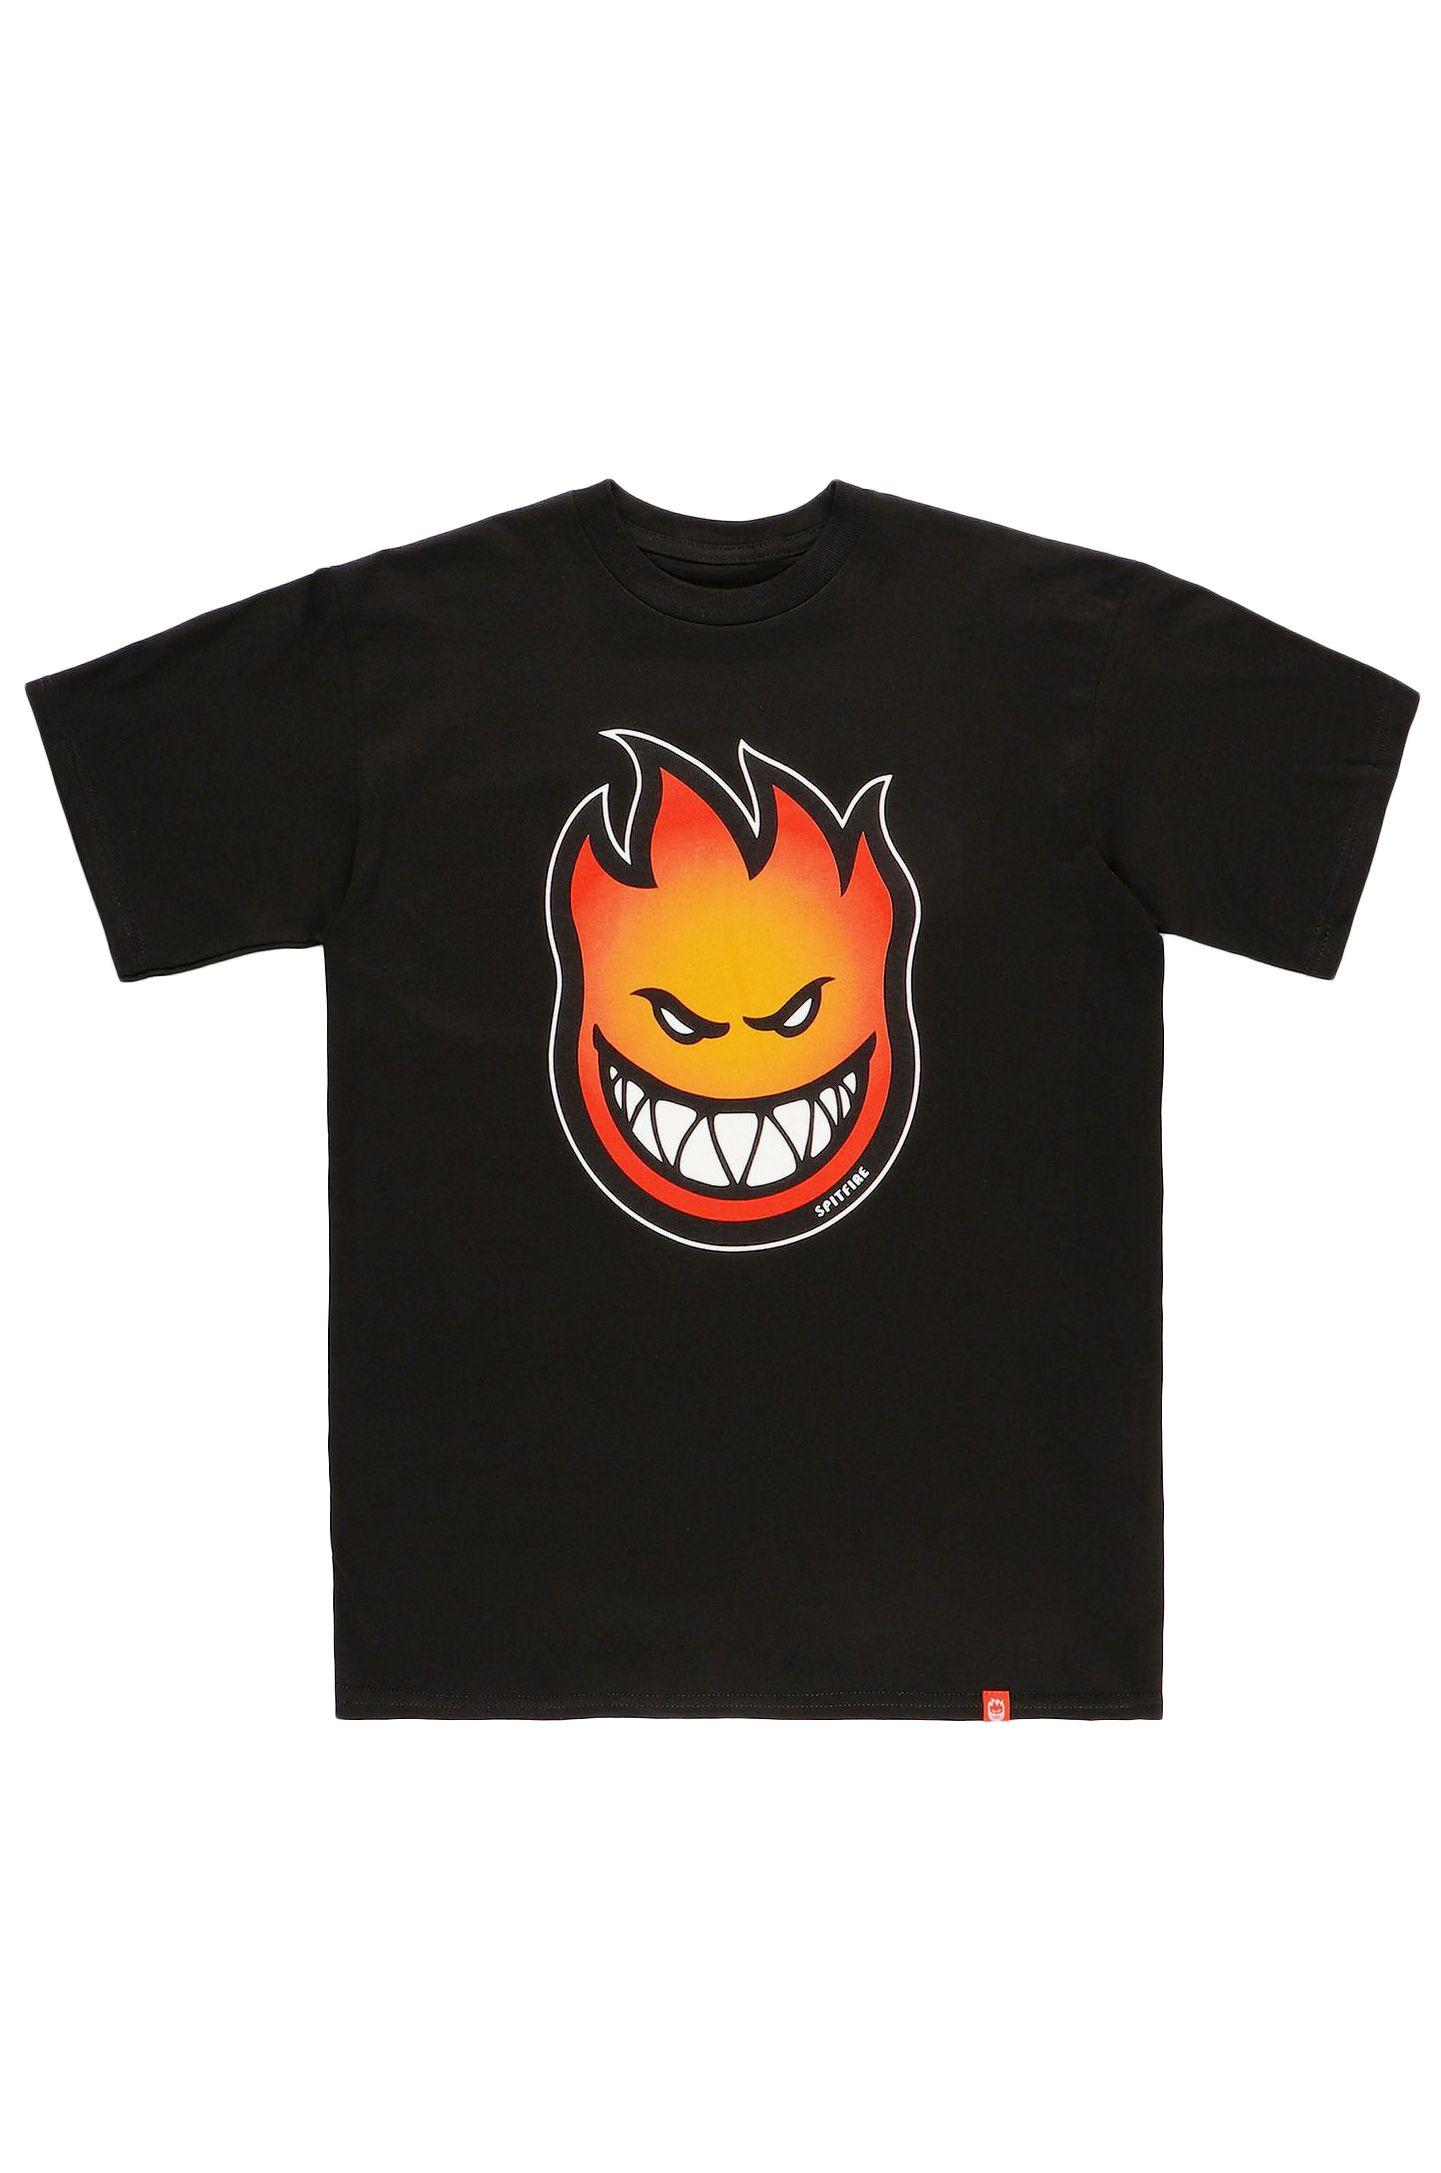 Spitfire T-Shirt BIGHEAD FADE FILL Black W/ Gold To Red Fade Print